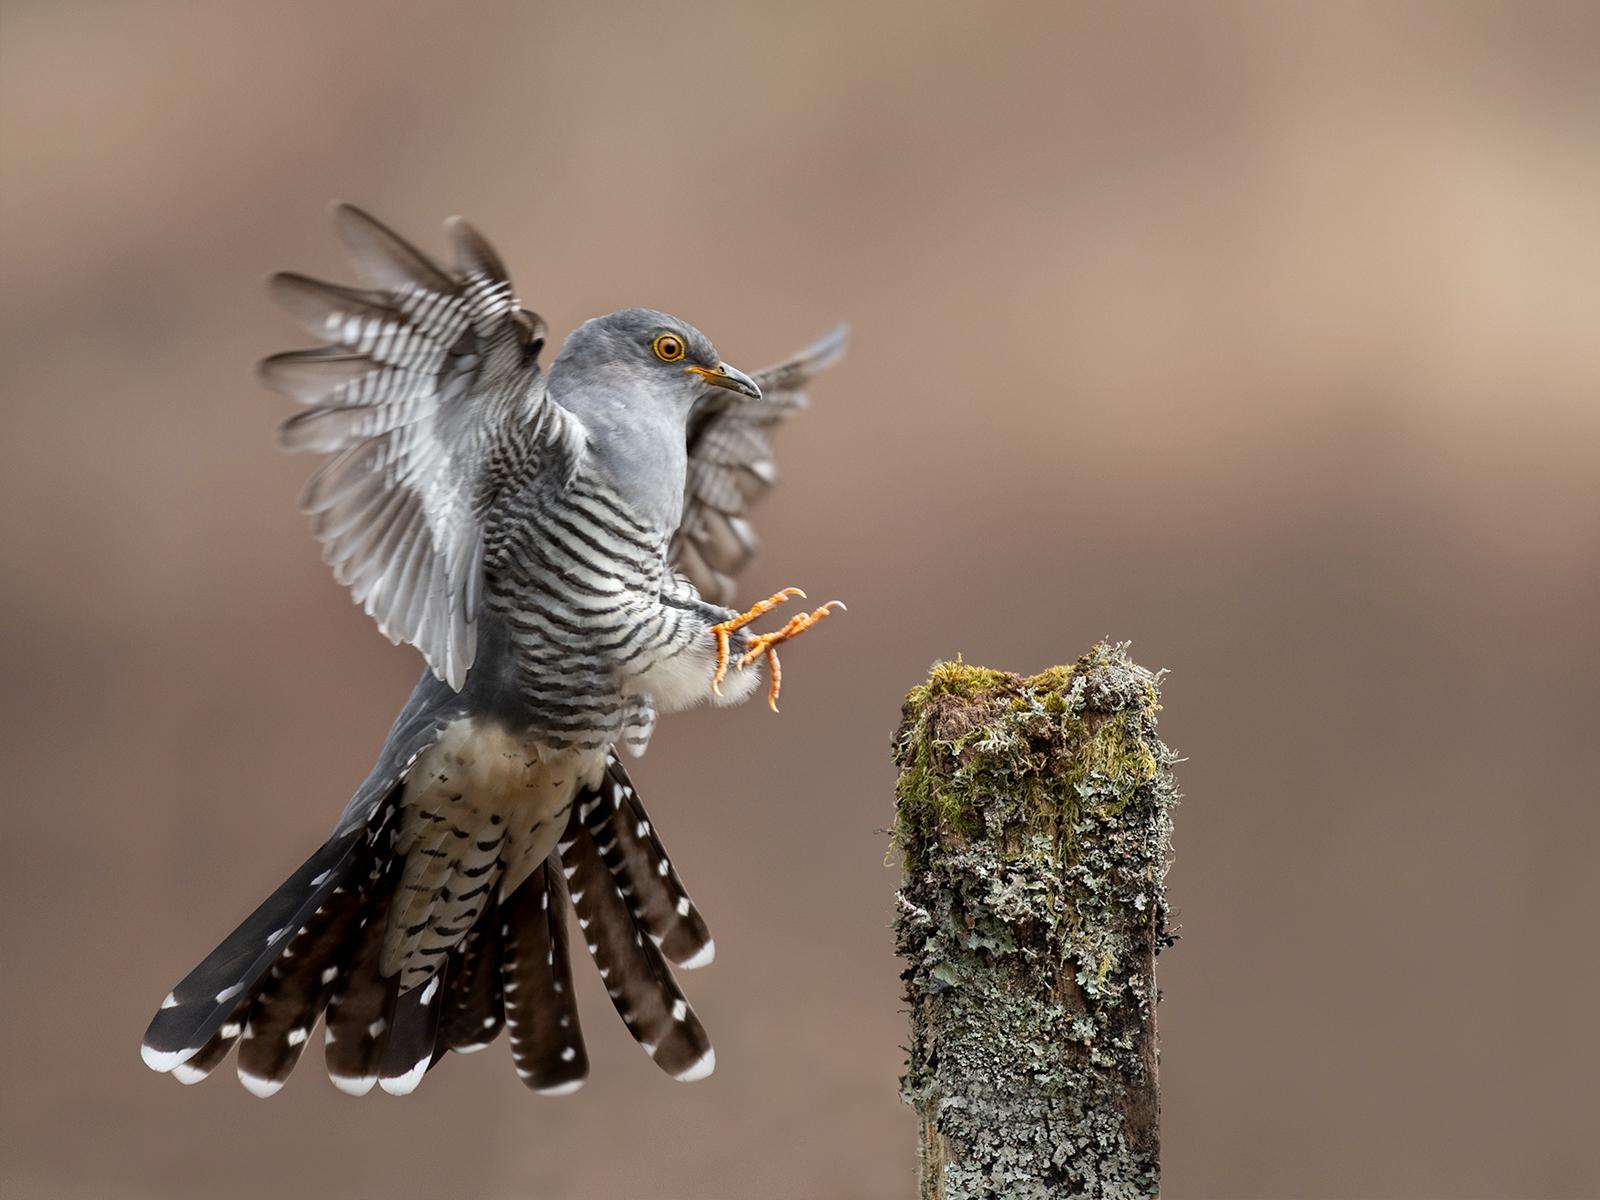 W0454638_Philip Barber_Male cuckoo landing